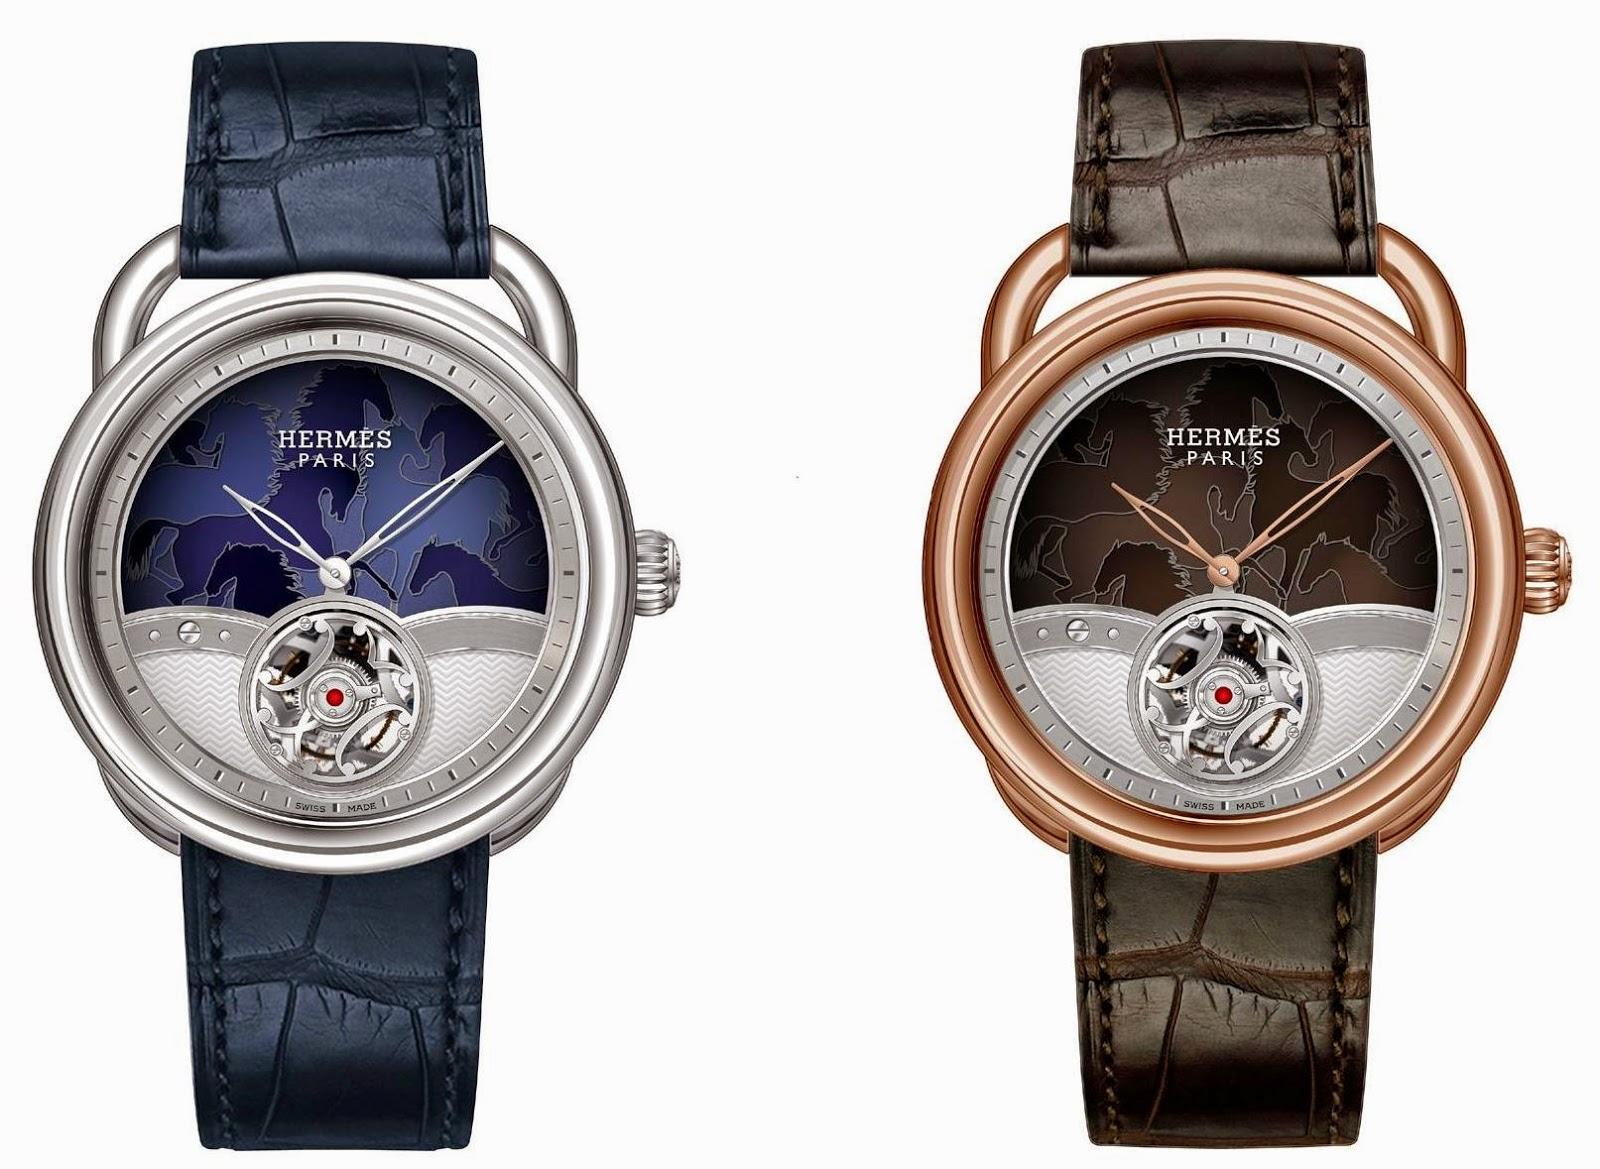 Hermès Arceau Lift Chevaux en camouflage watch with flying tourbillon